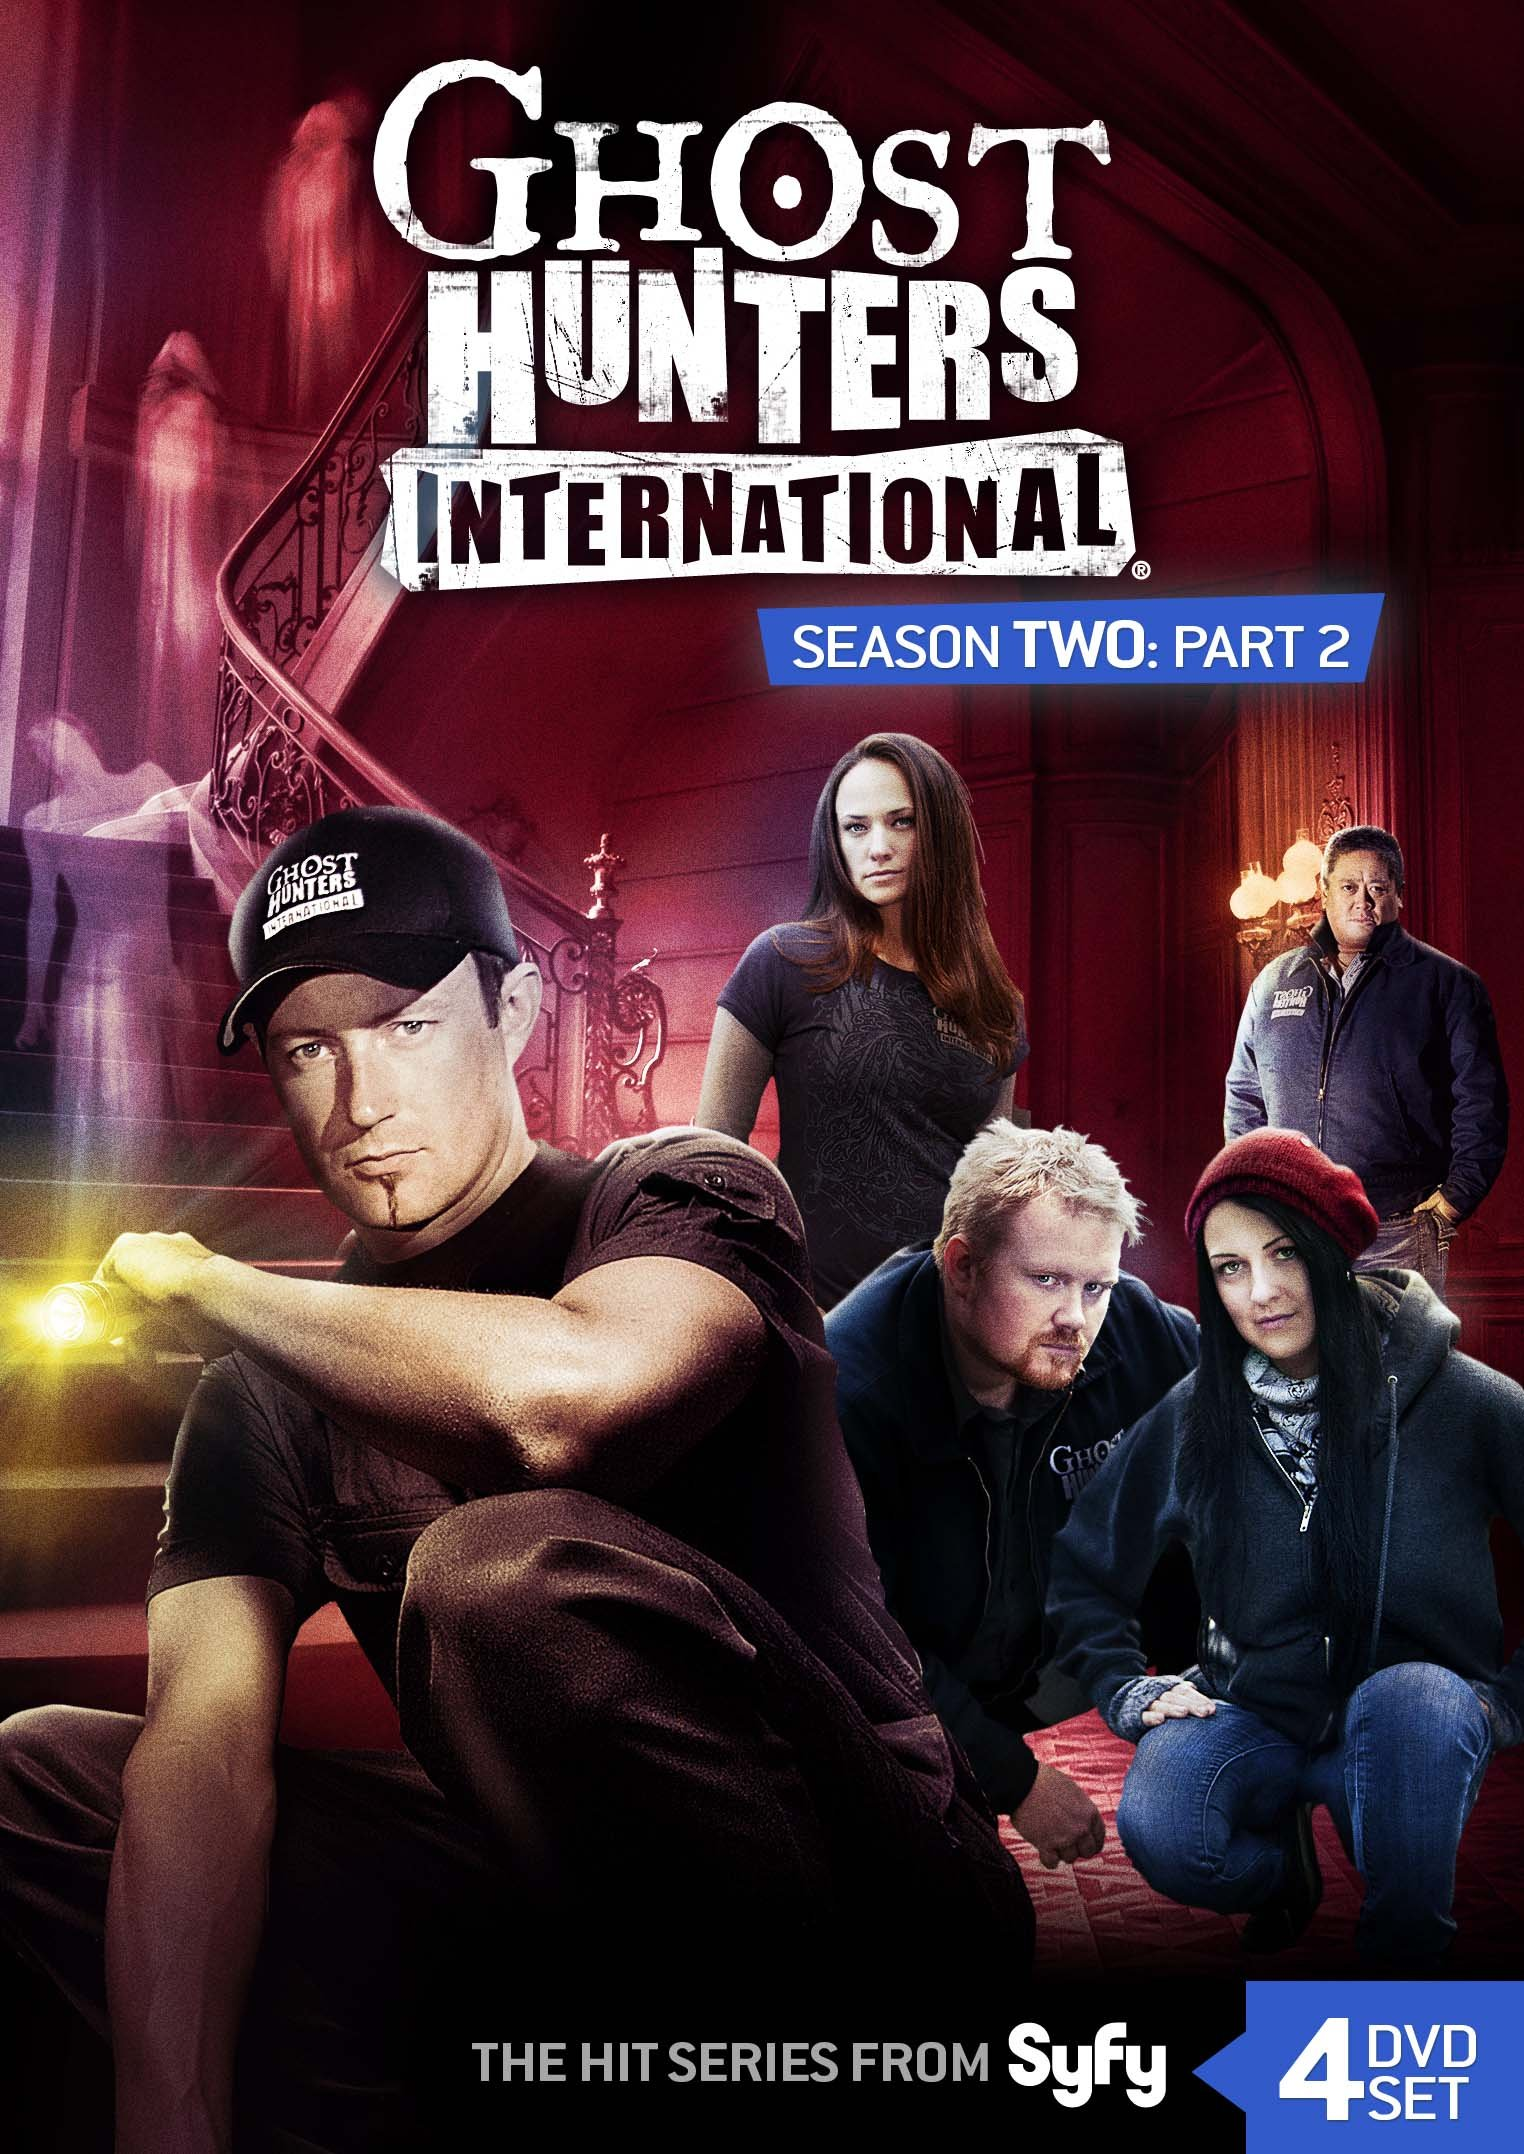 Ghost Hunters International Season 2: Part 2